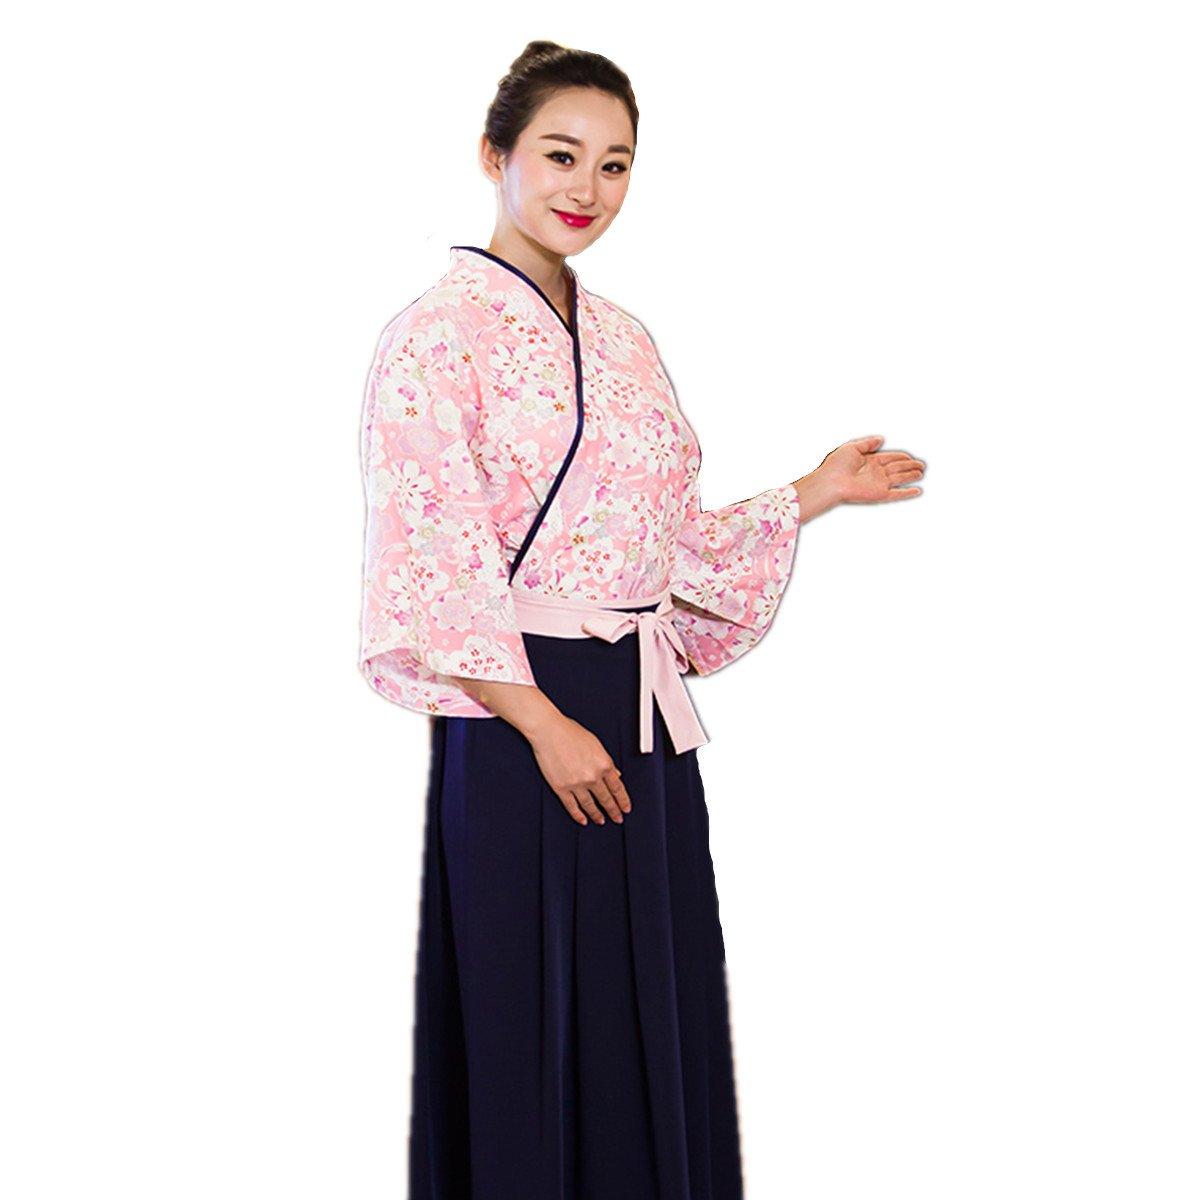 XINFU Sushi Waitress Uniform Pink Sakura 3/4 Long Sleeve Restaurant Japanese Kimono Kitchen Work Coat